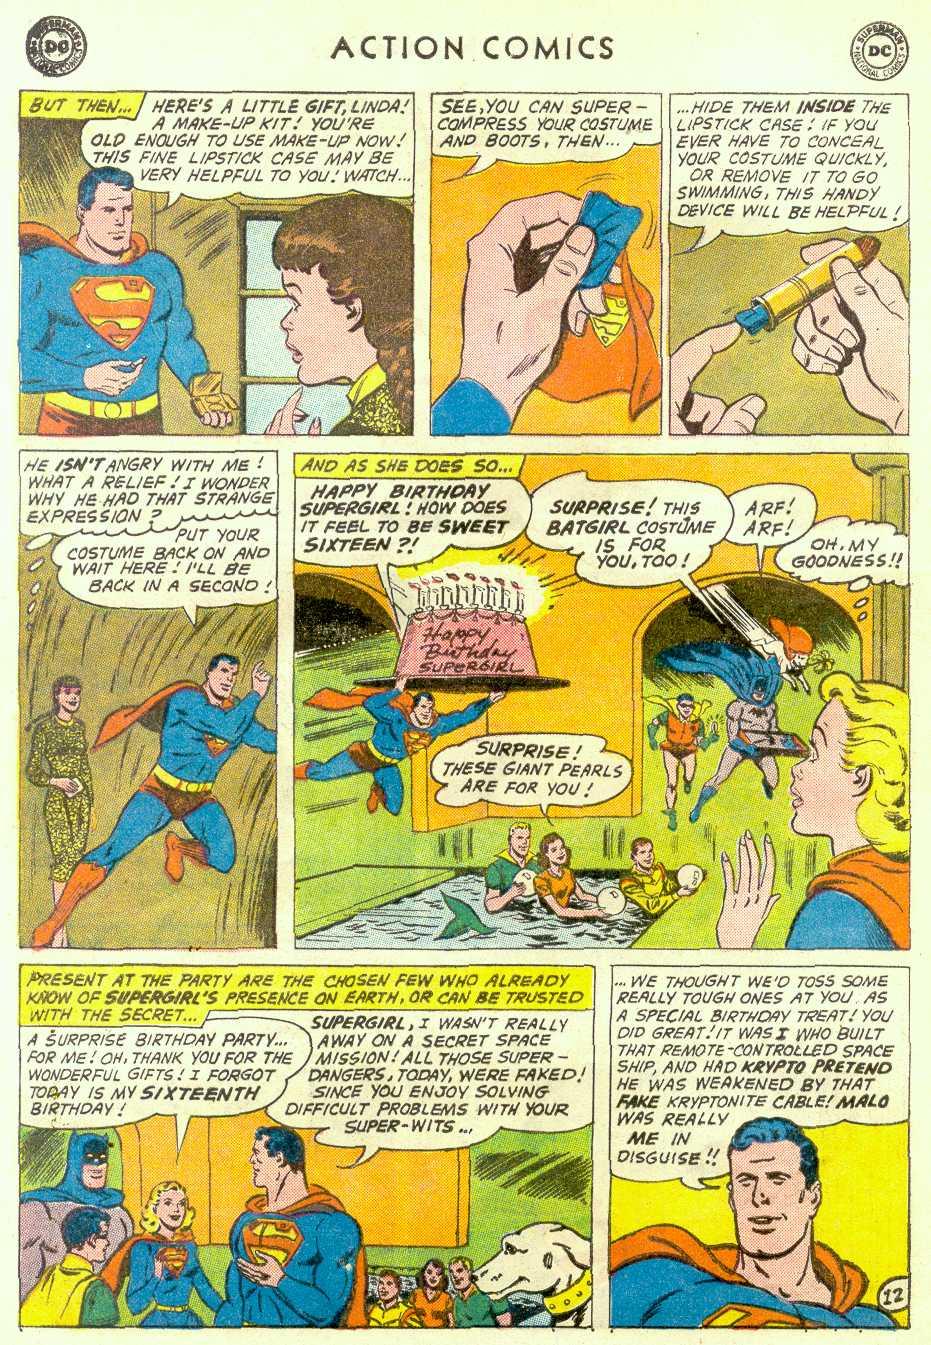 Action Comics (1938) 270 Page 27